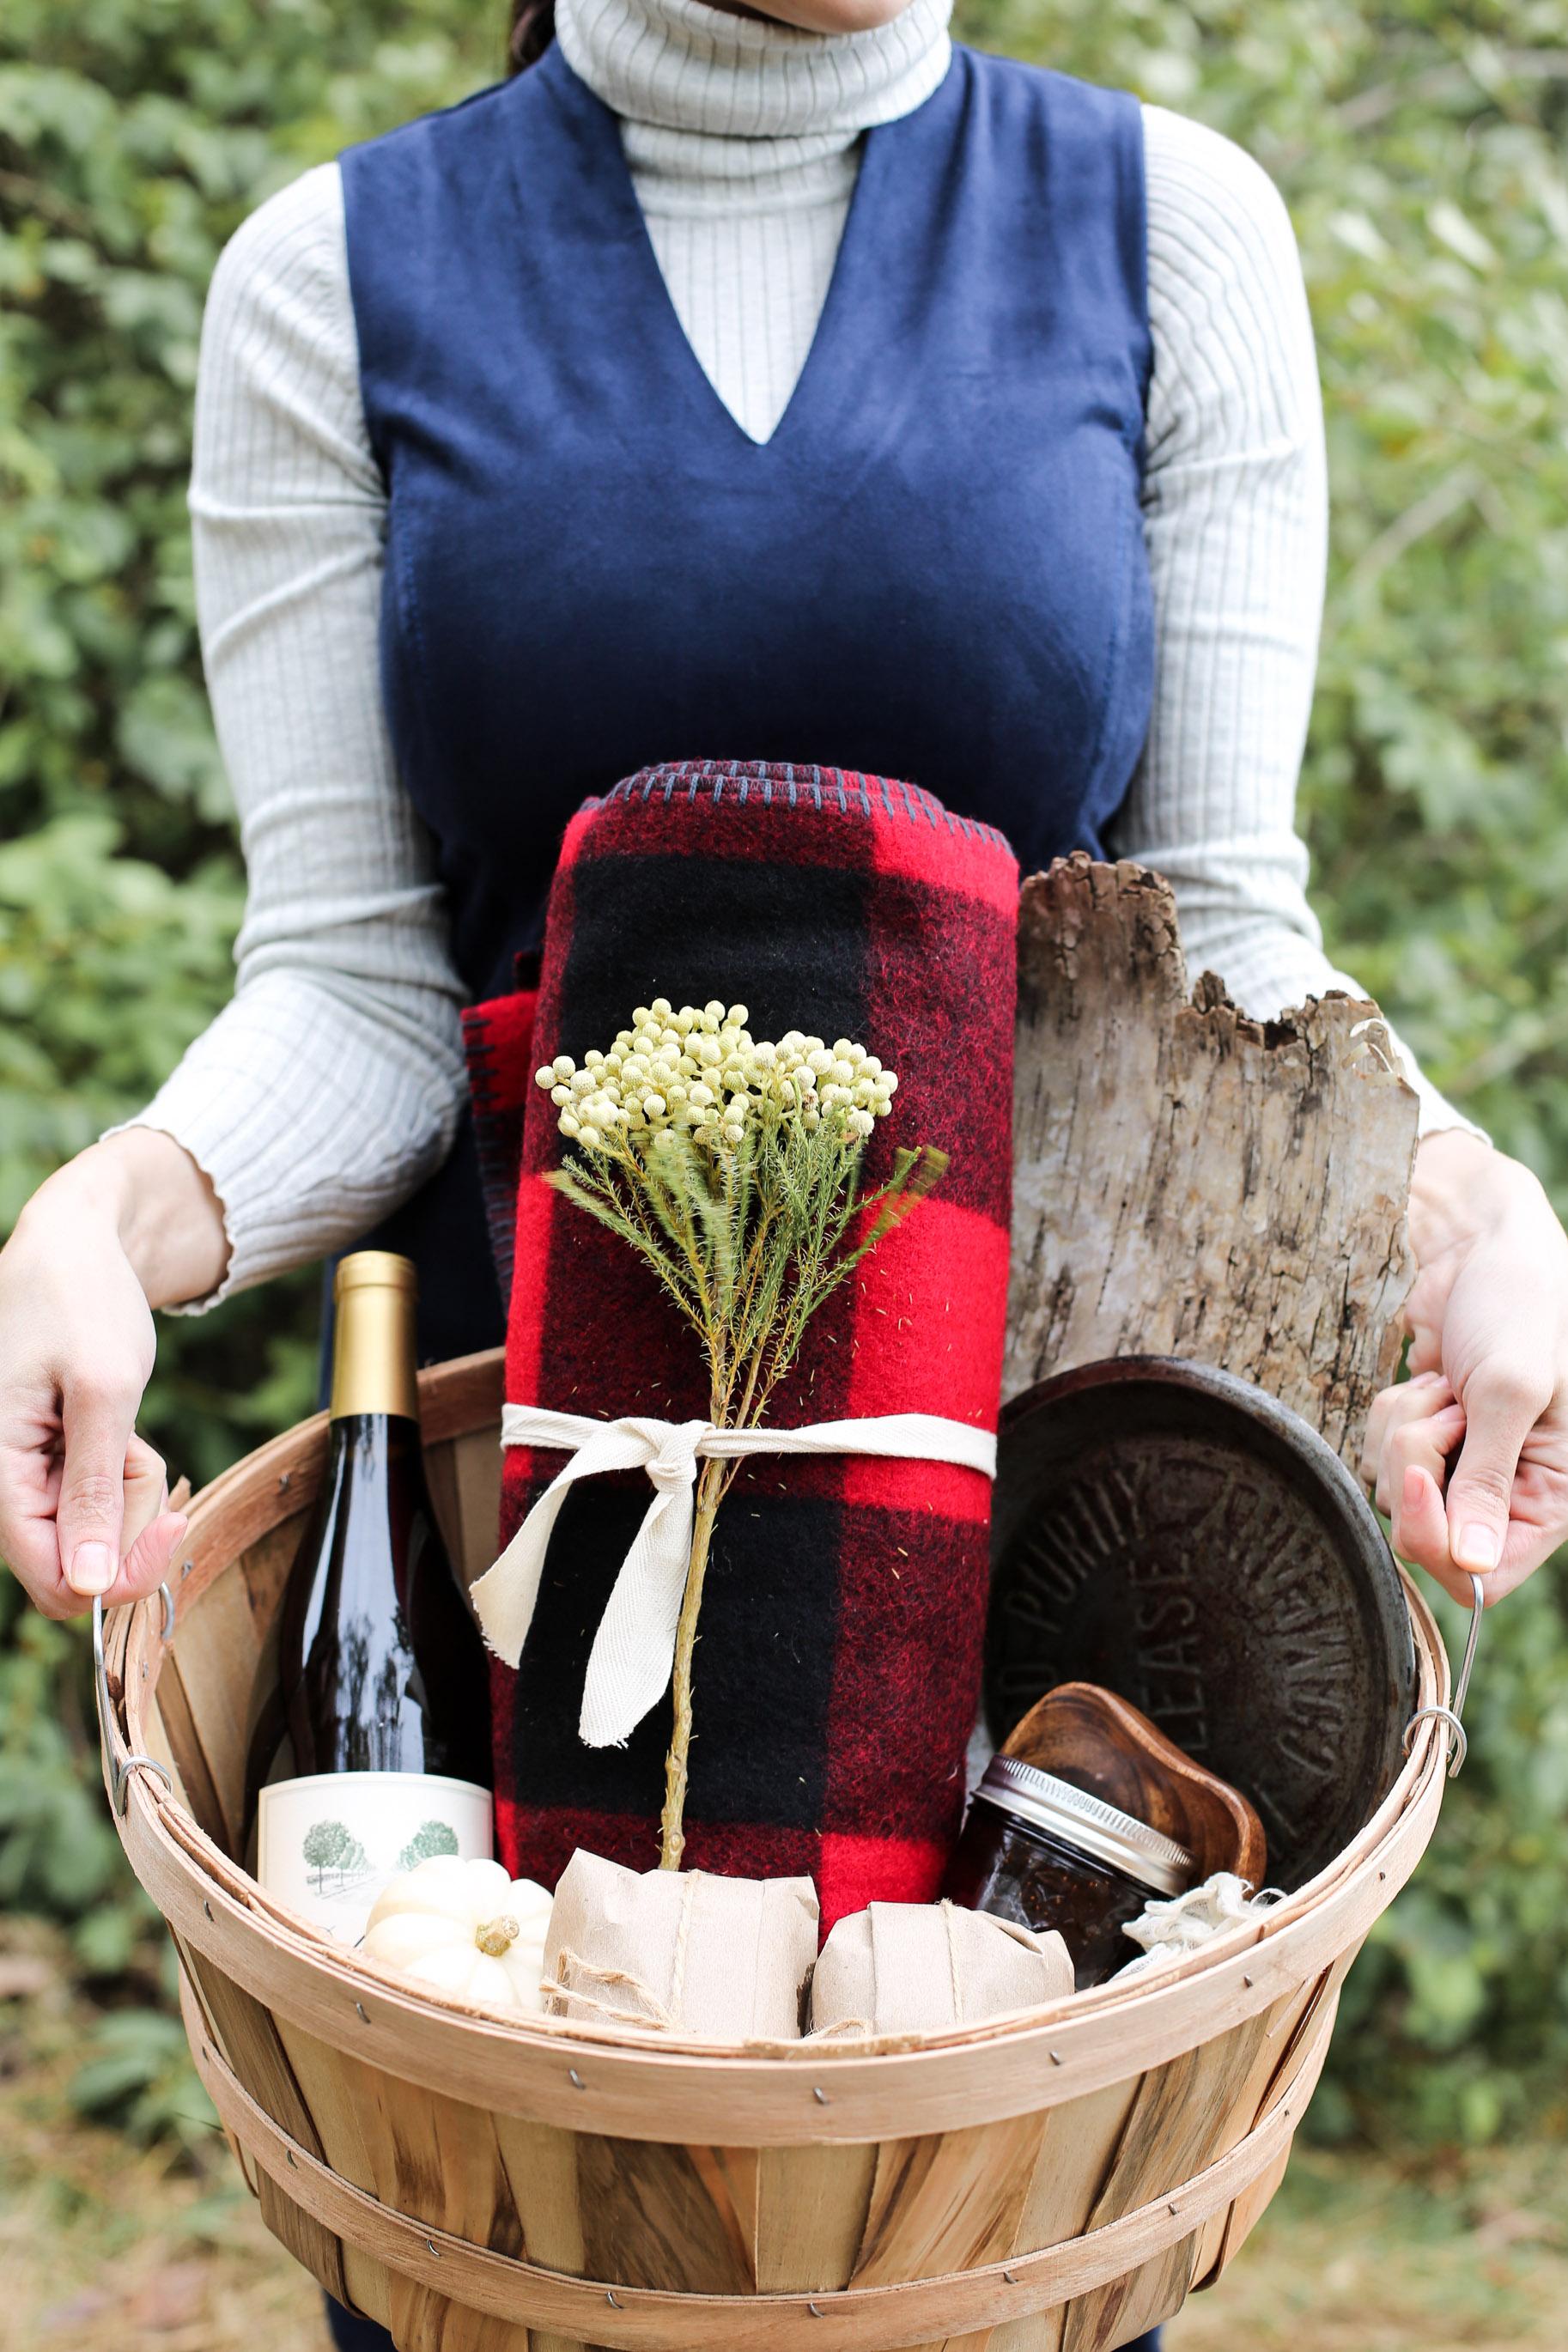 Fall-Wine-Tasting-Picnic15.jpg